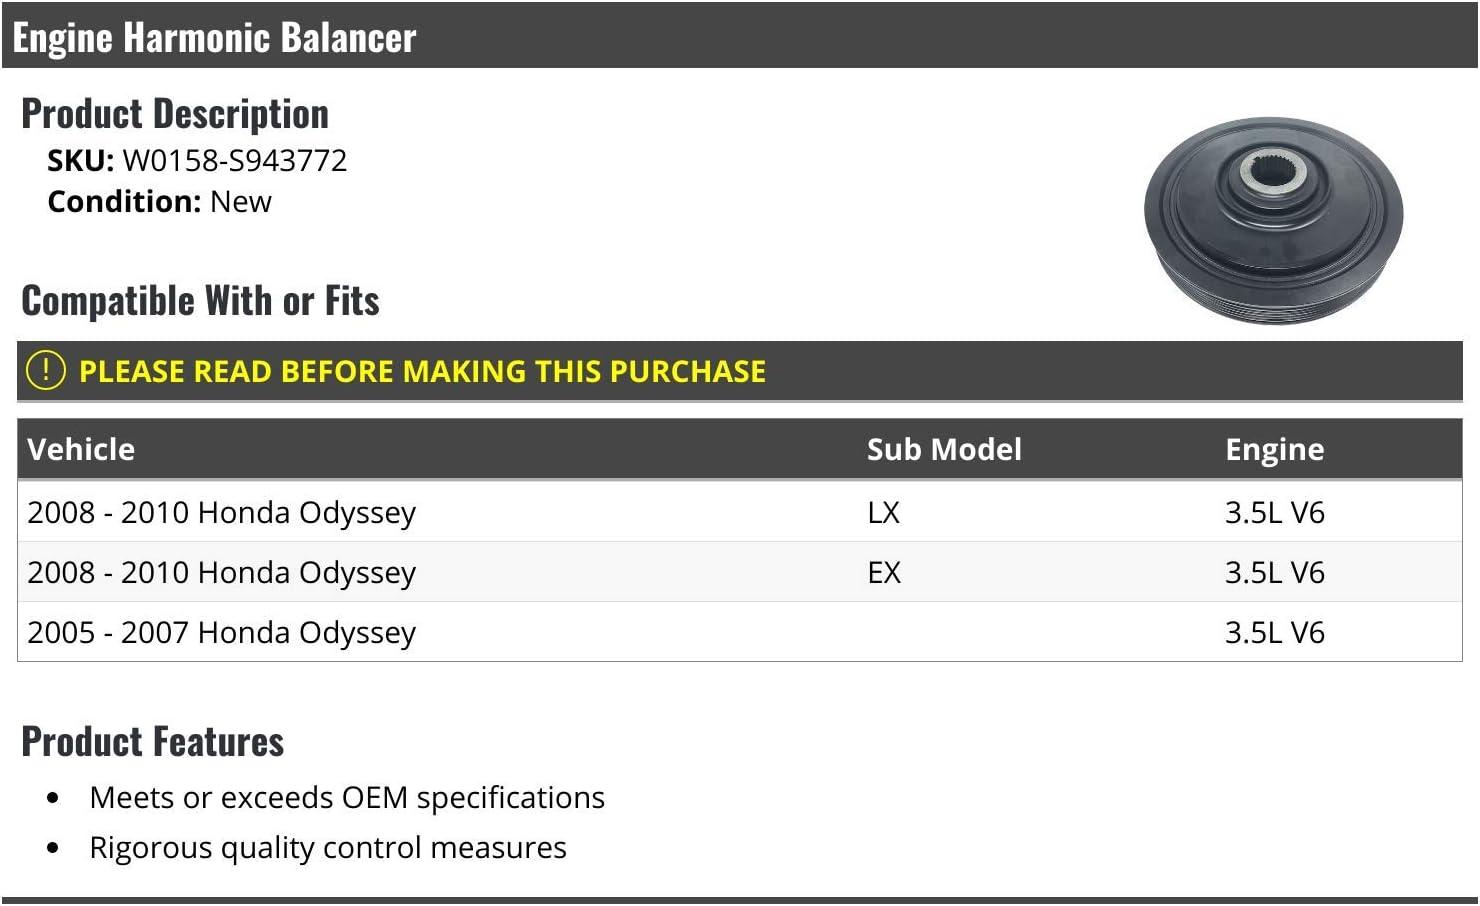 Engine Harmonic Balancer Compatible with 2005-2010 Honda Odyssey 3.5L V6